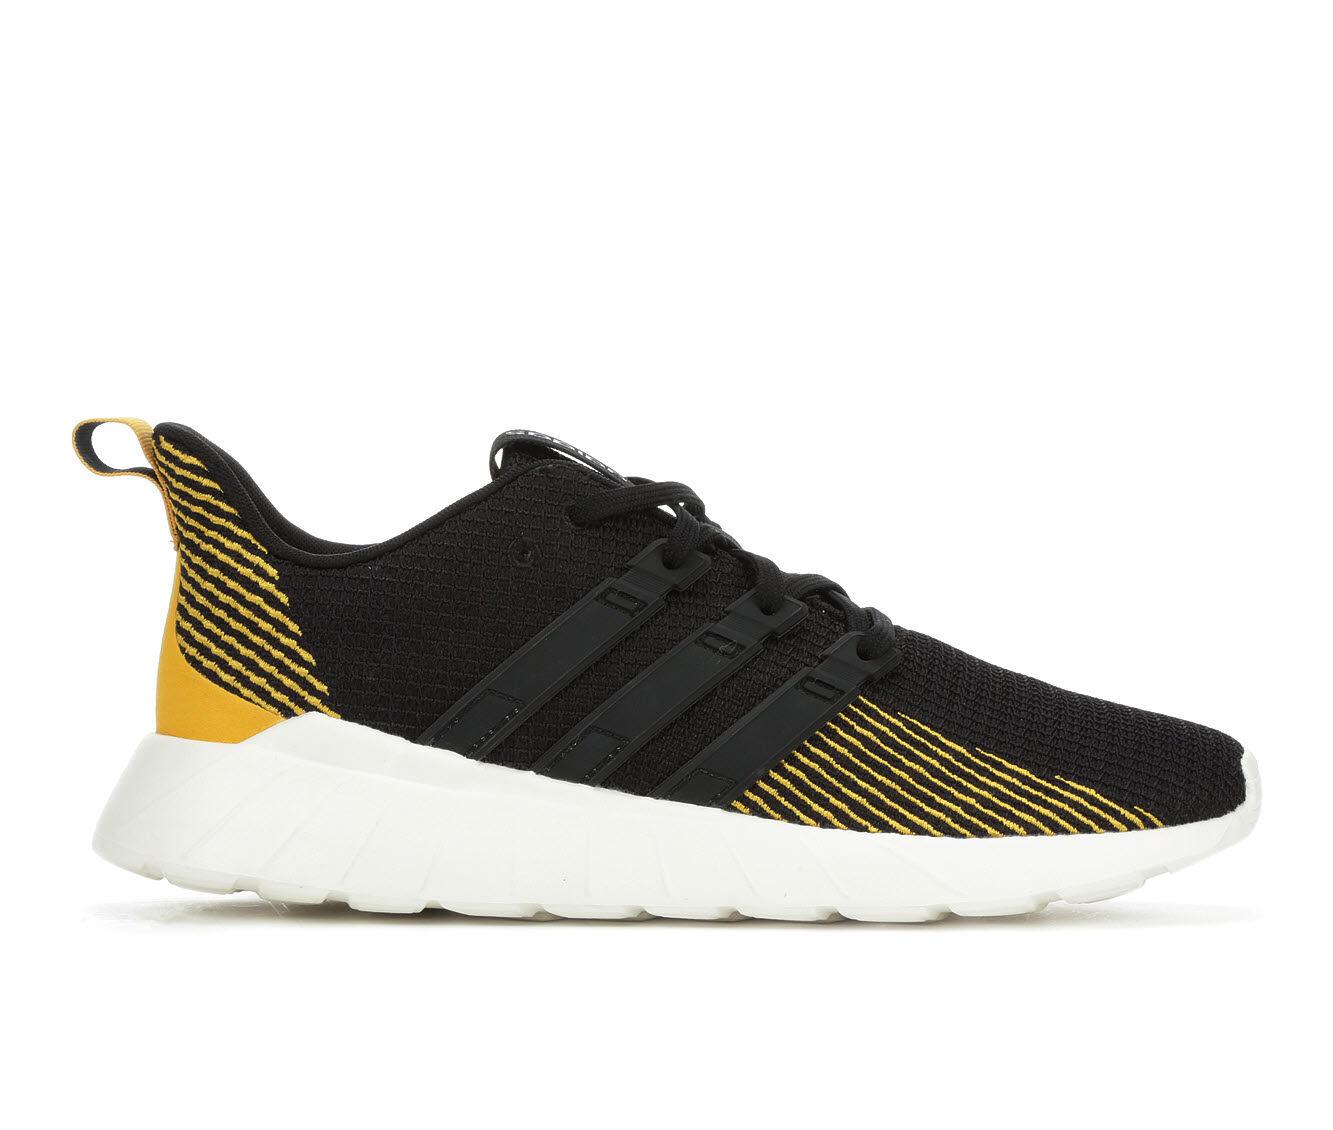 Men's Adidas Questar Flow Running Shoes Blk/Gold/Wht